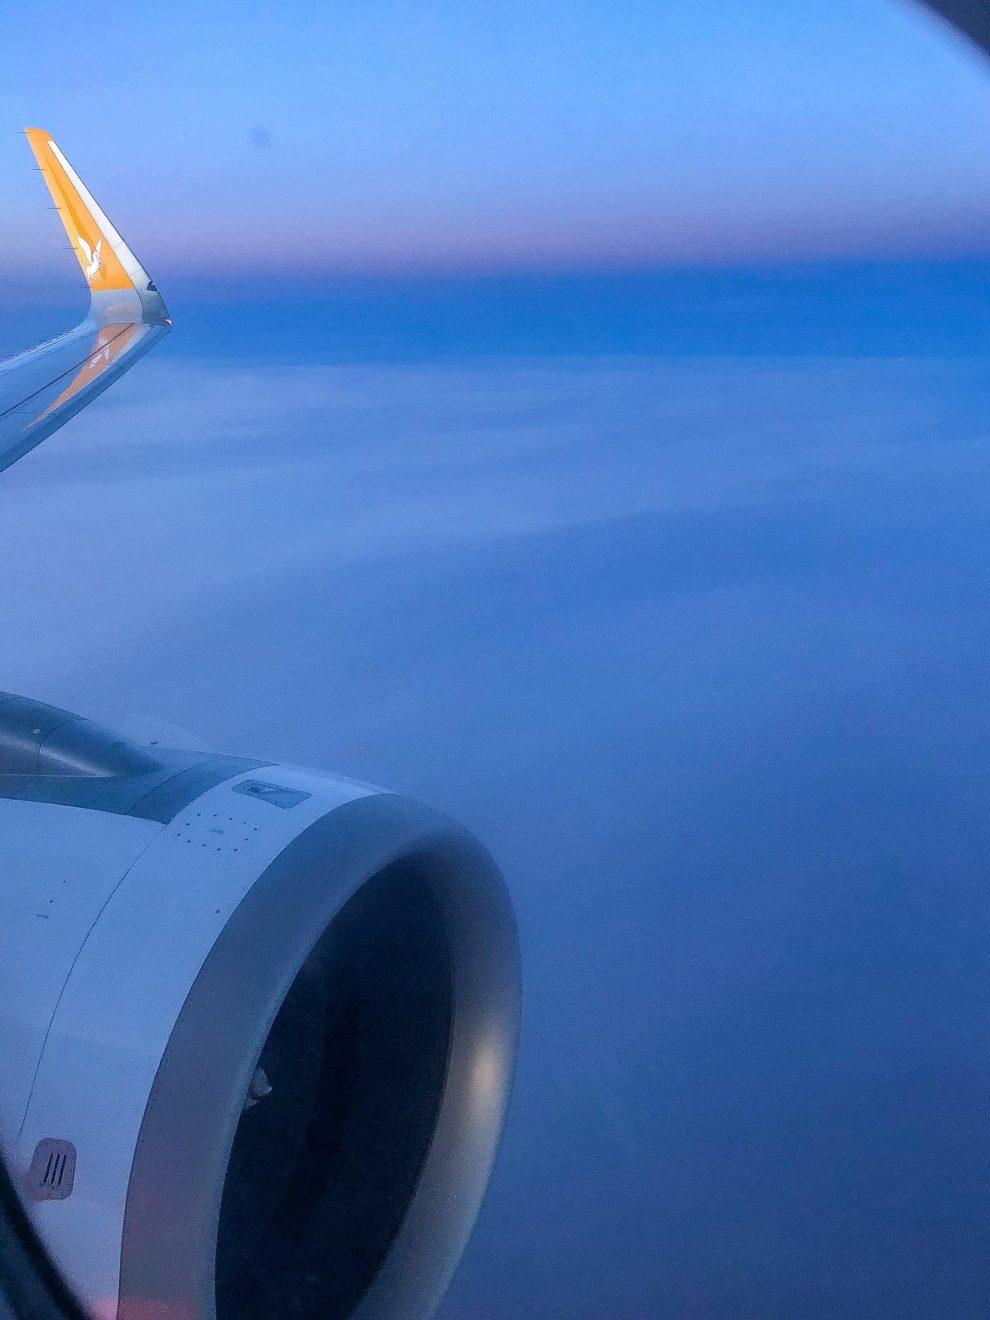 Vakantie Ras Al Khaimah tips - Vliegen naar Ras Al Khaimah